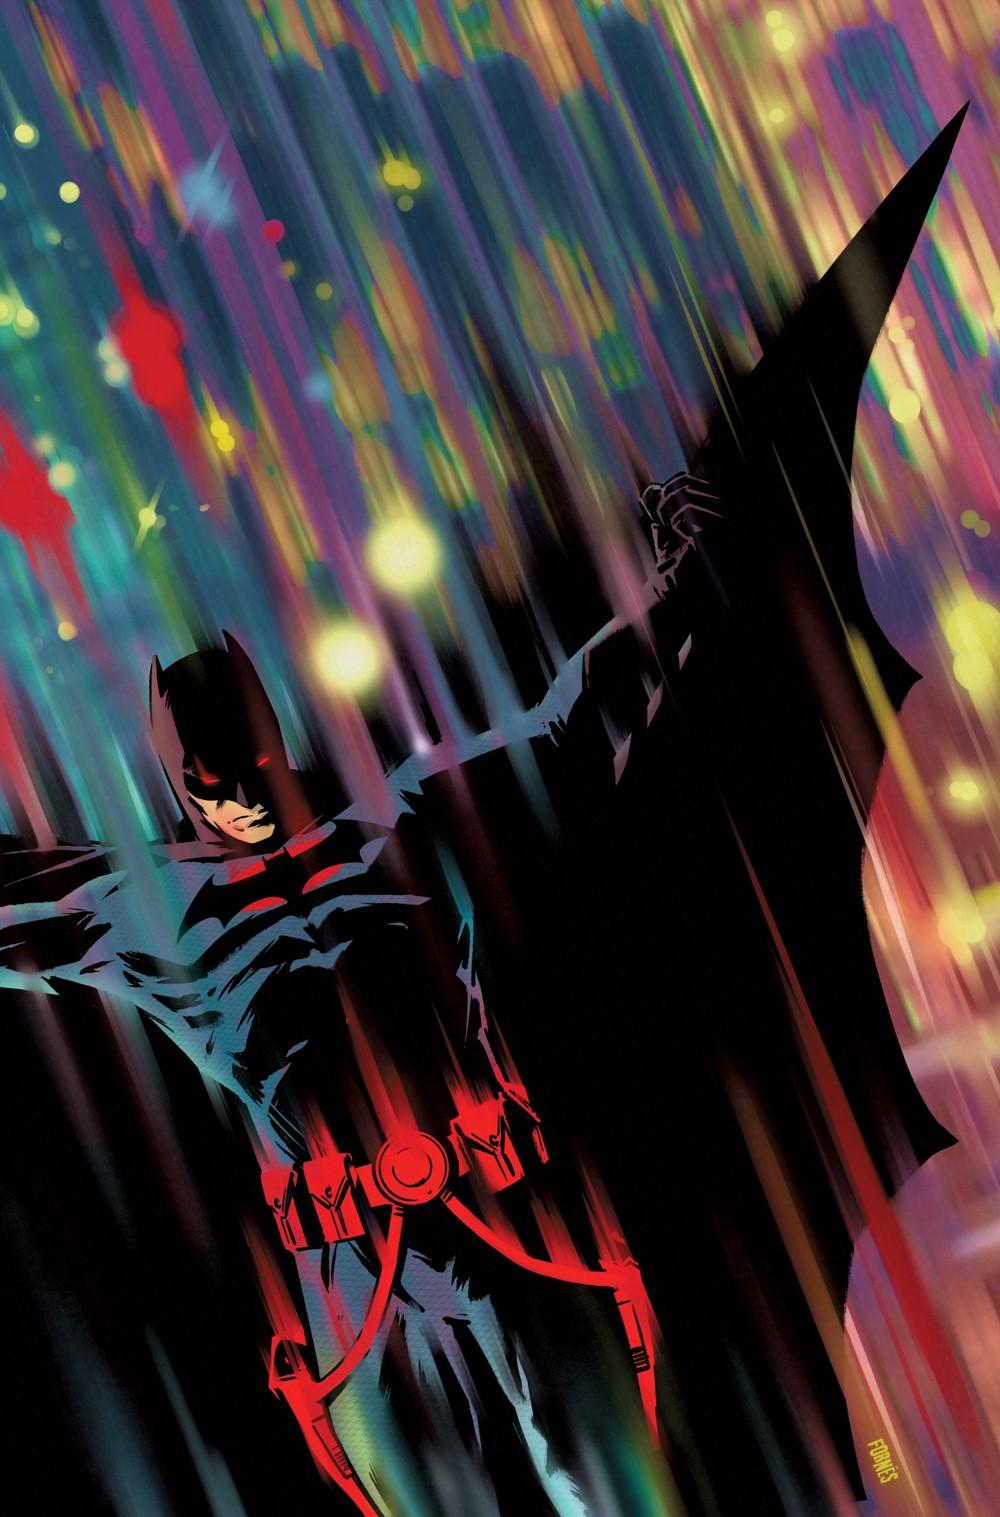 Justice-League-Incarnate-1-Variant-Cover DC Comics November 2021 Solicitations